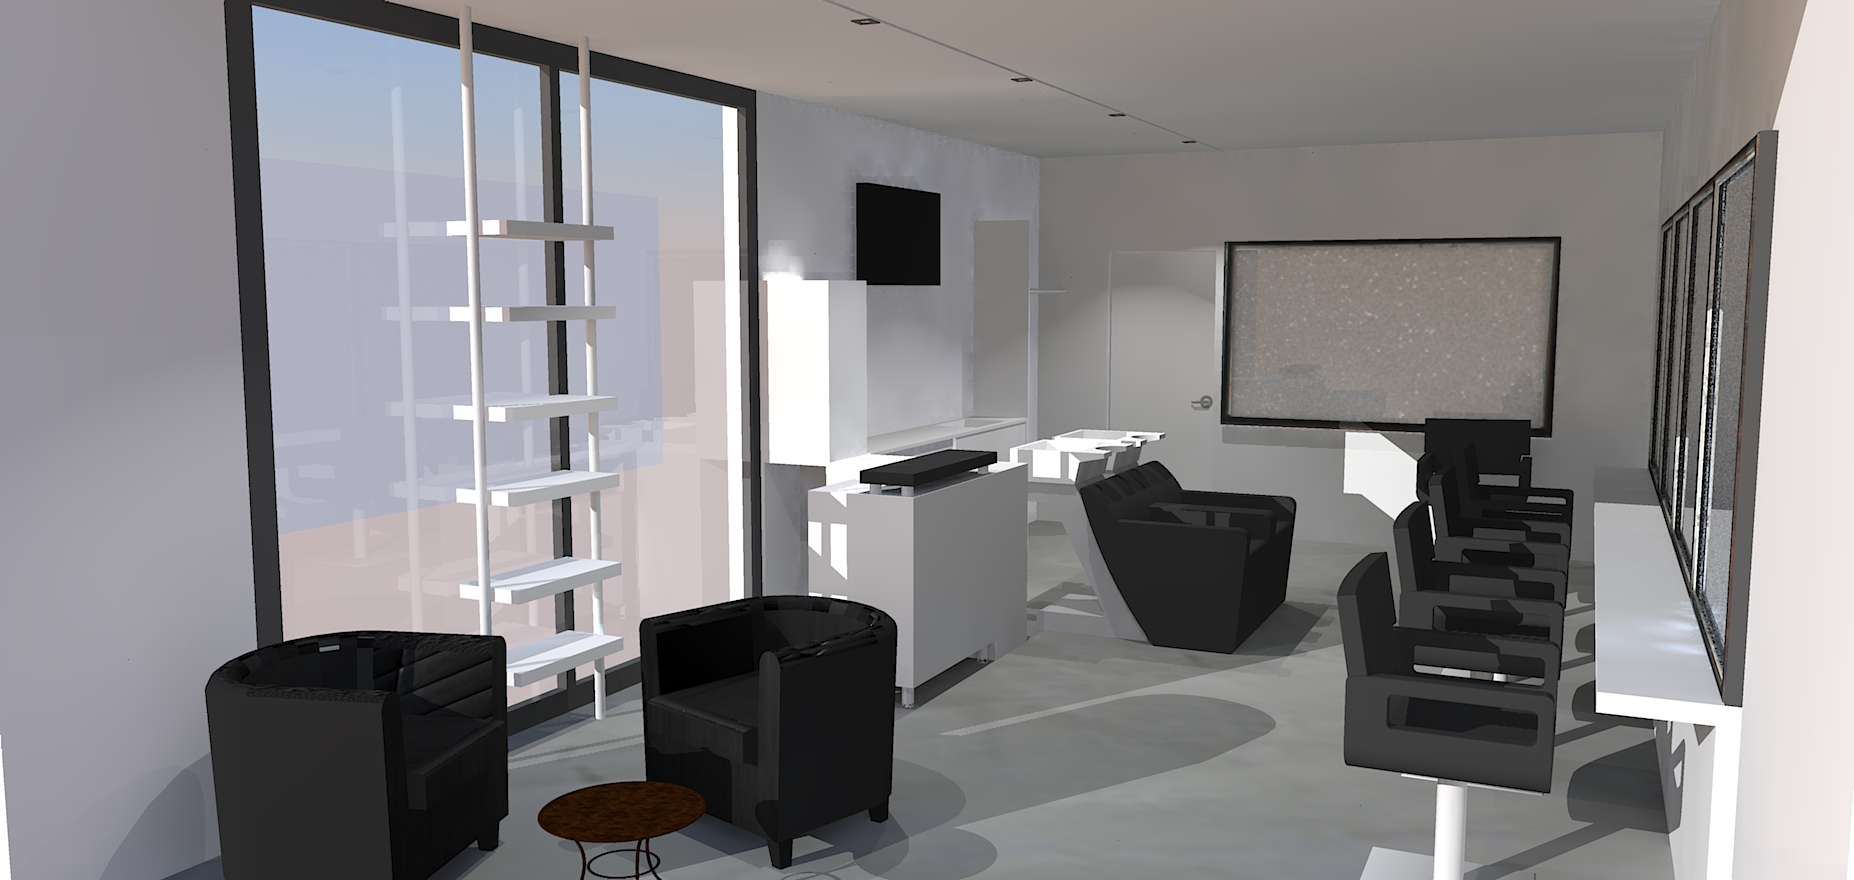 professionnels herv br maud maitre d 39 oeuvre b timent poitiers. Black Bedroom Furniture Sets. Home Design Ideas